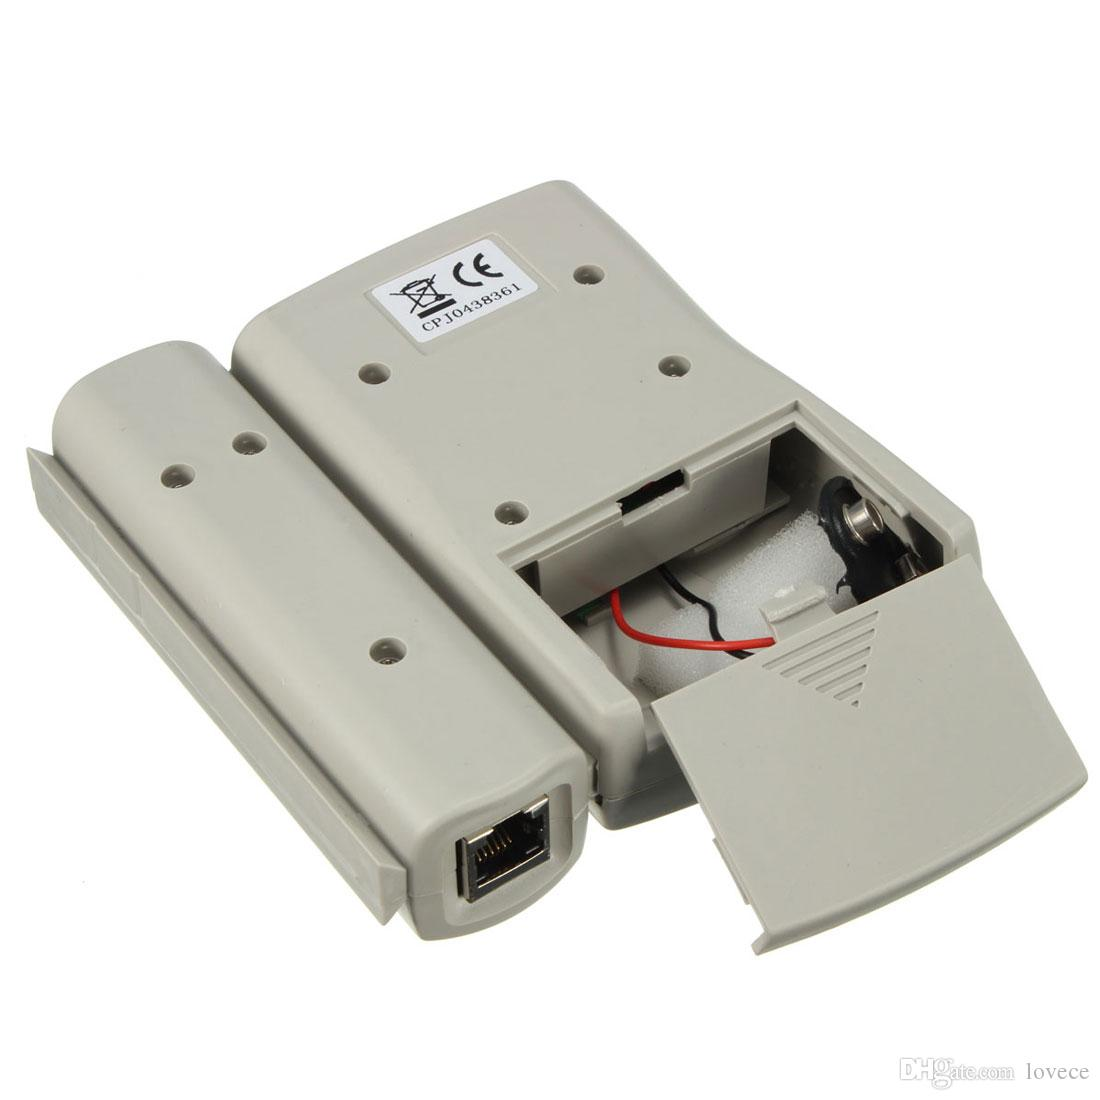 RJ45 RJ11 RJ12 CAT5 LAN Network Tool Kit كبل اختبار تجعيد المكشكش ذو طيات NET_005